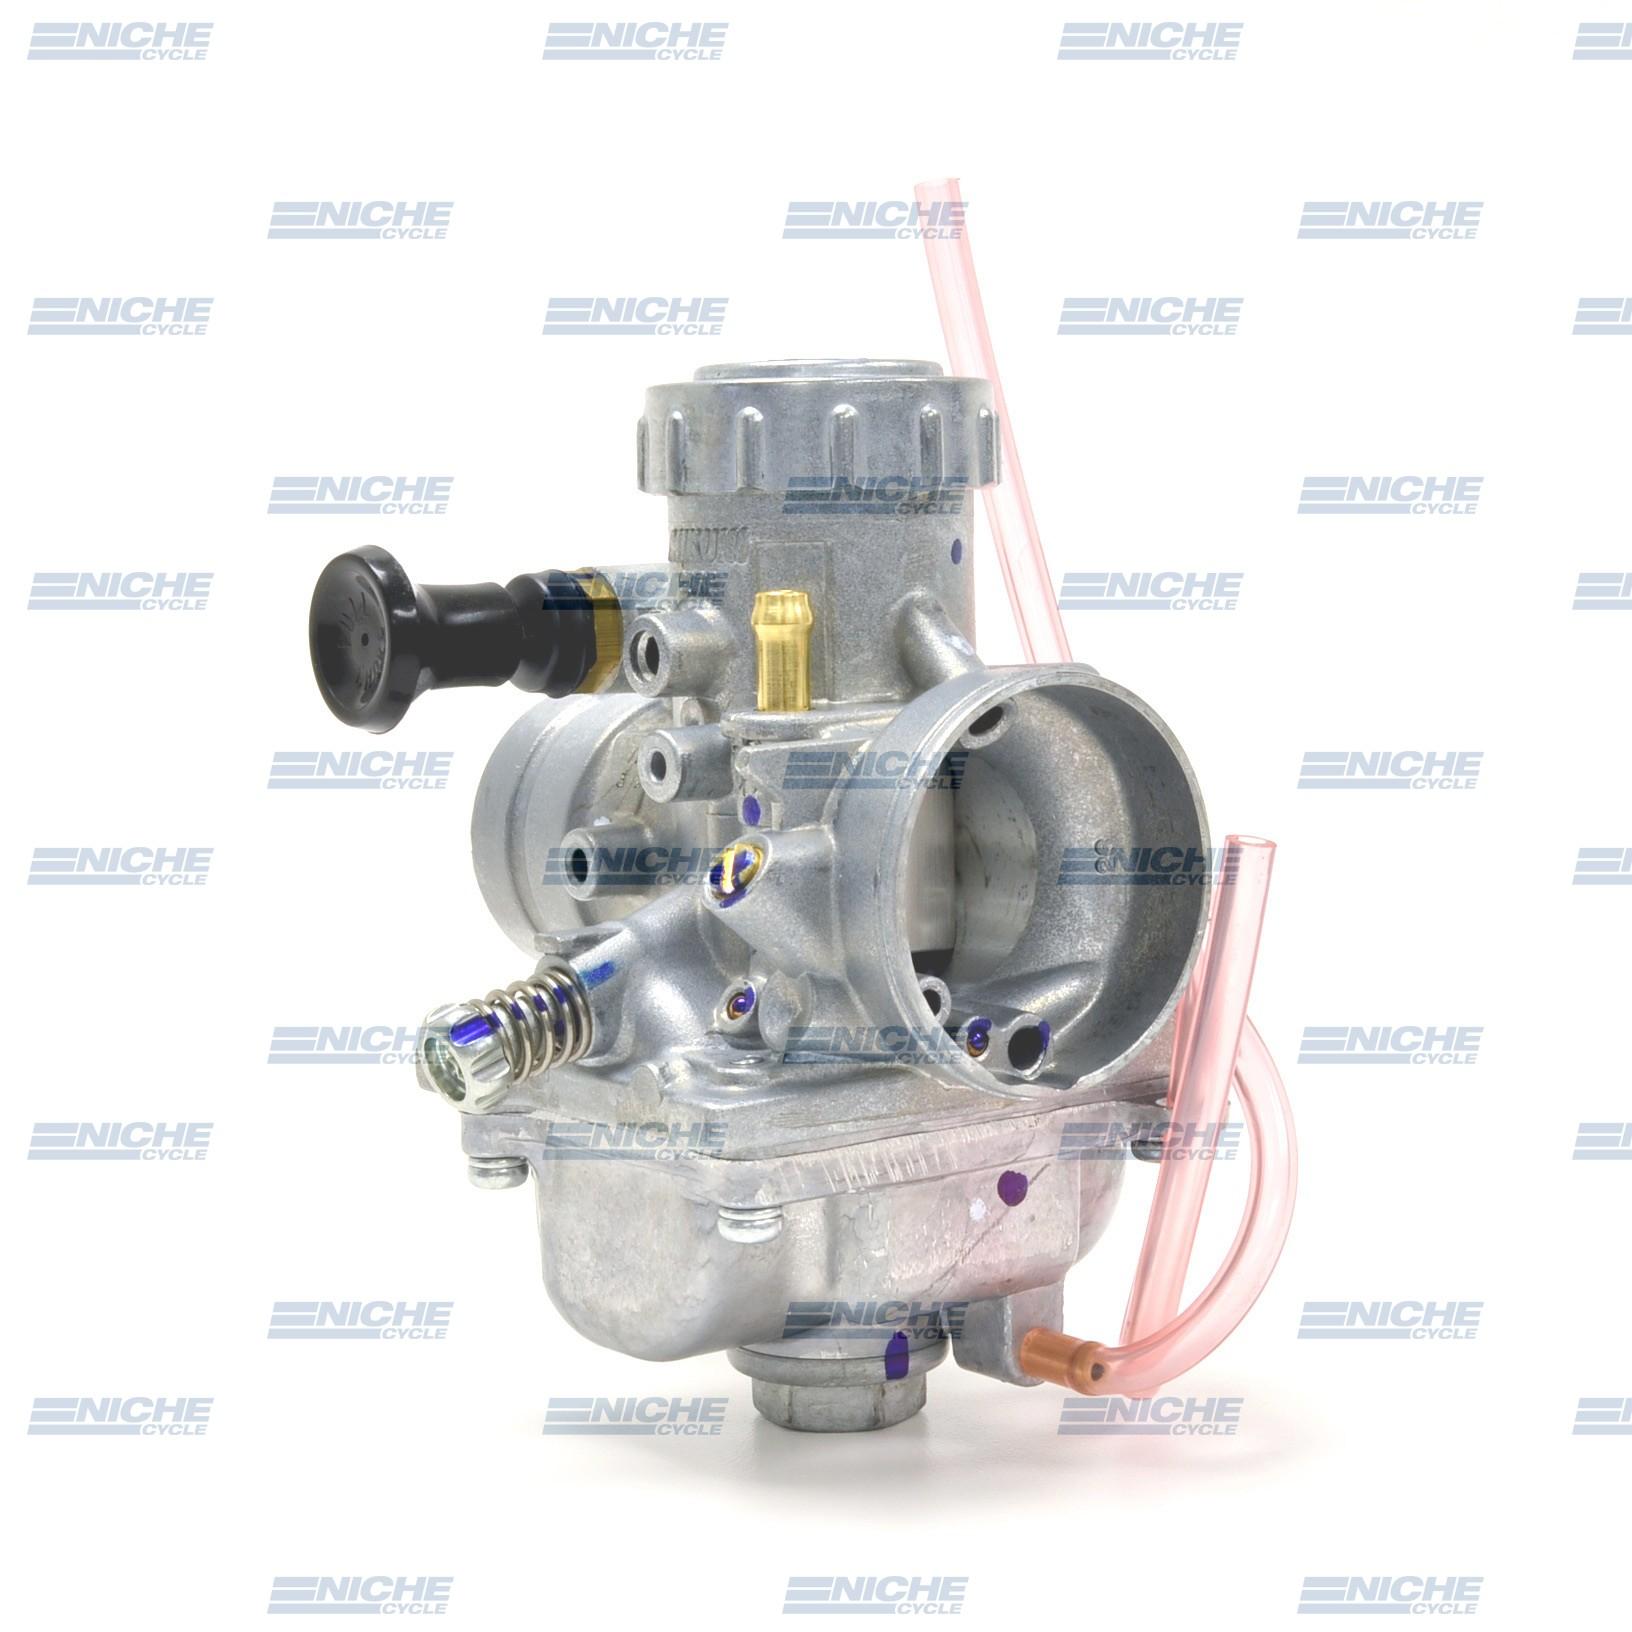 Mikuni 26mm Yamaha TTR125 PreJetted Carburetor VM26-TTR125 Genuine Genuine  Mikuni Carburetors | 2003 Yamaha Ttr 125 Wiring |  | Niche Cycle Supply